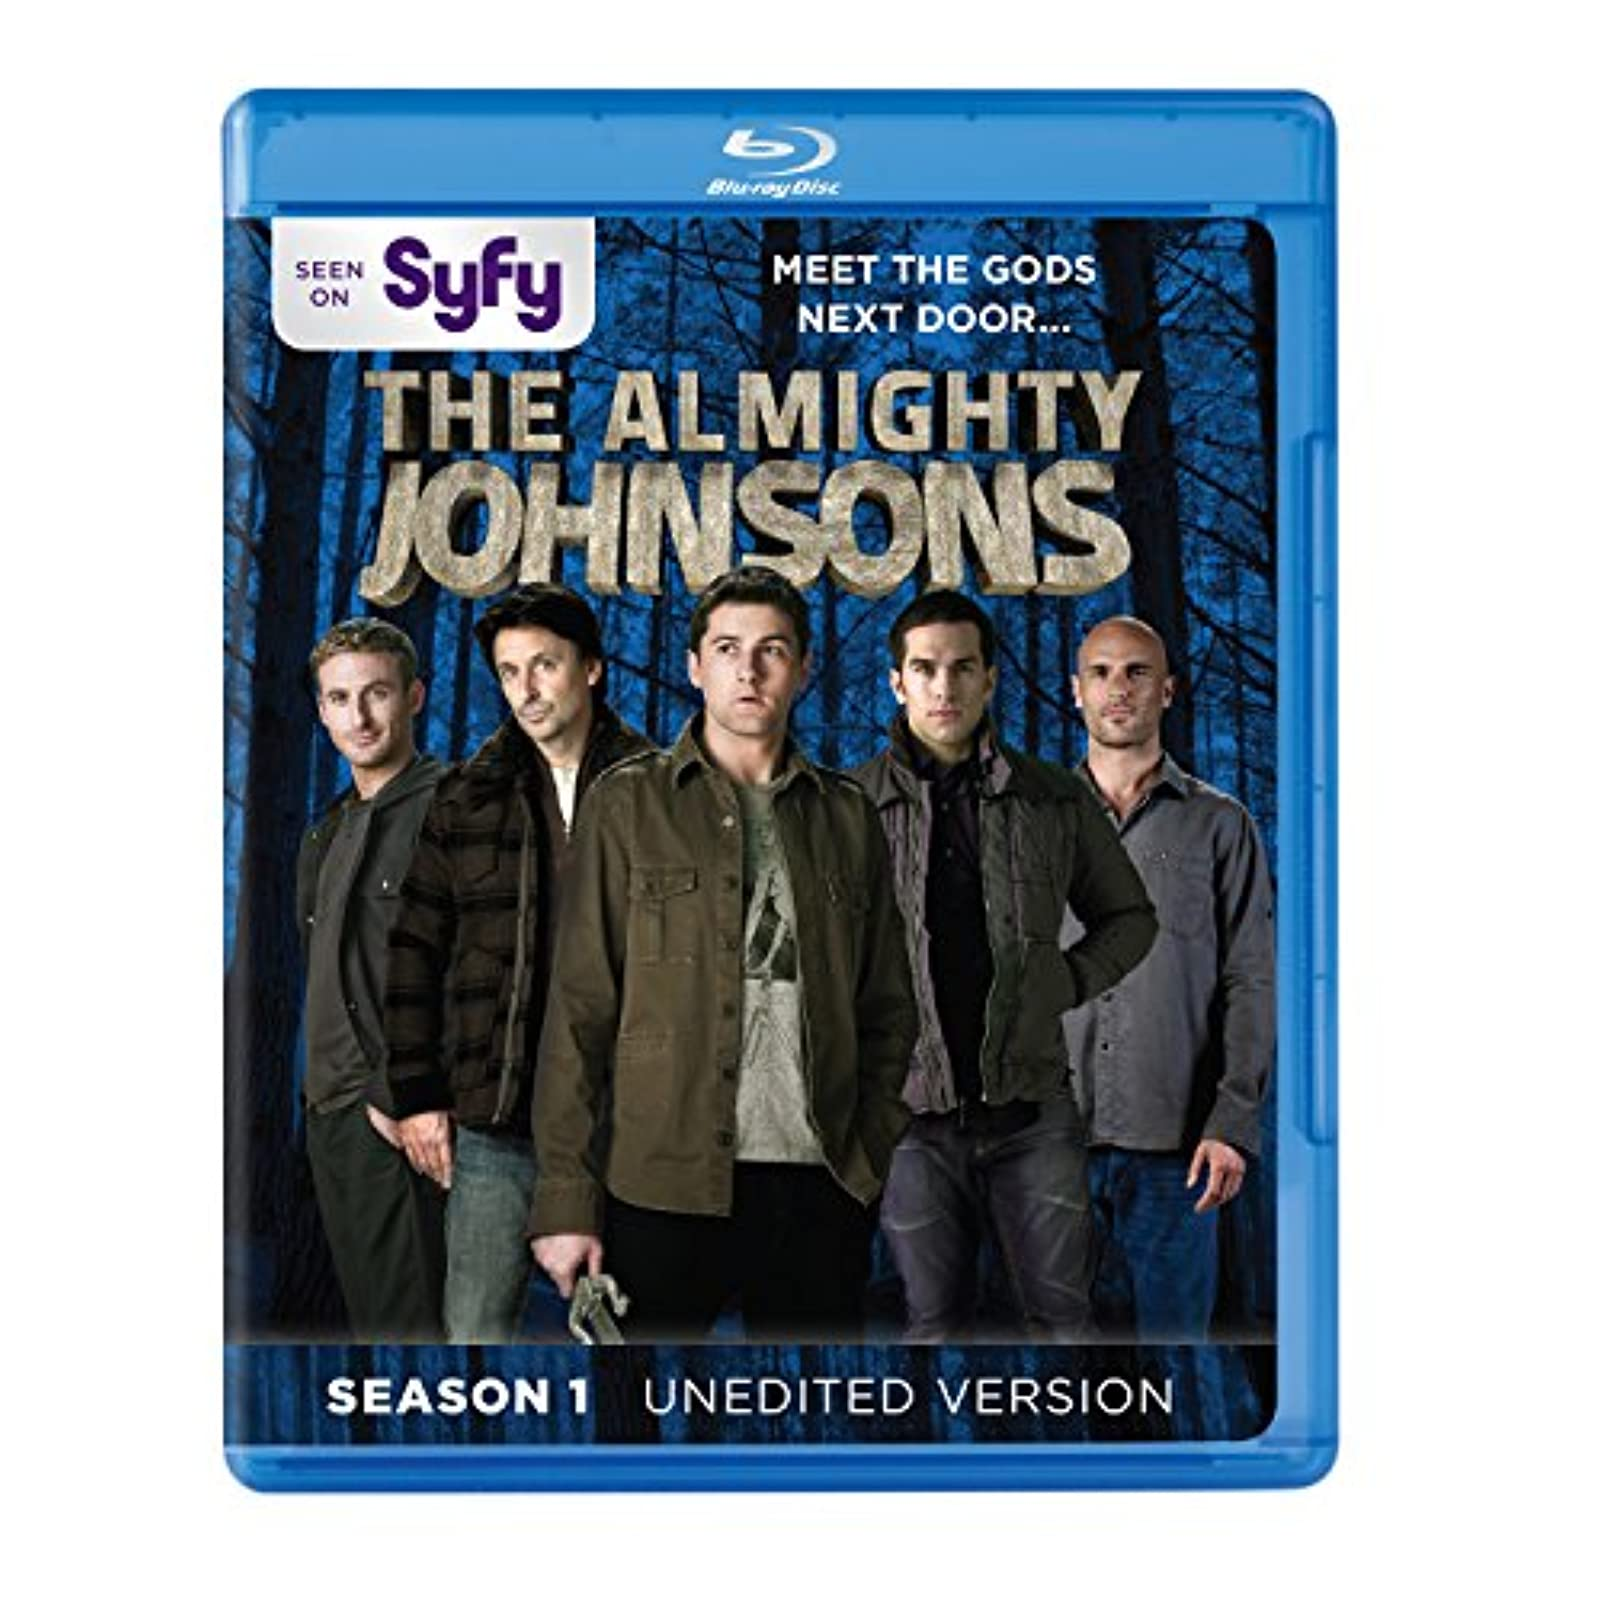 Almighty Johnsons: Season 1 Blu-Ray On Blu-Ray